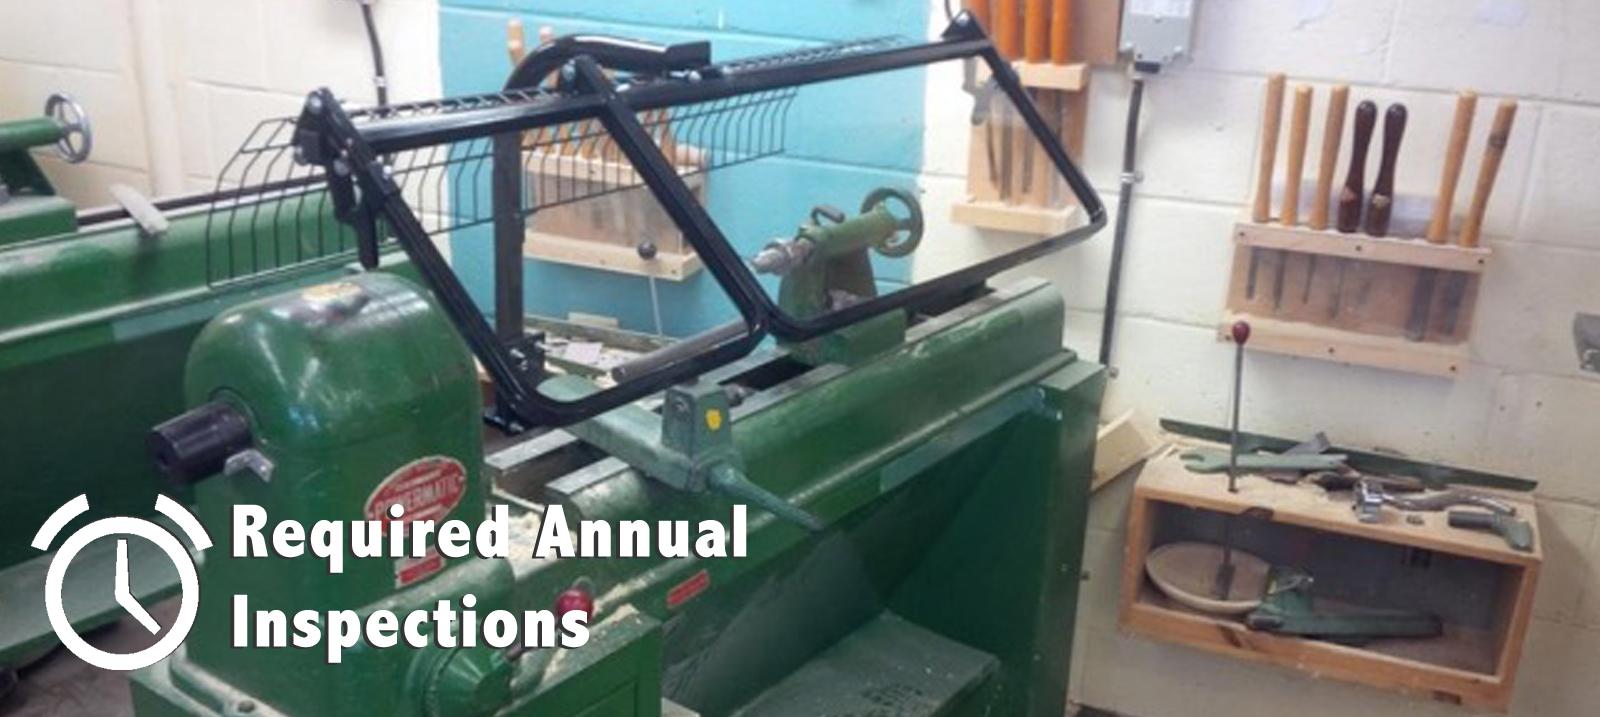 Shop Equipment Inspection